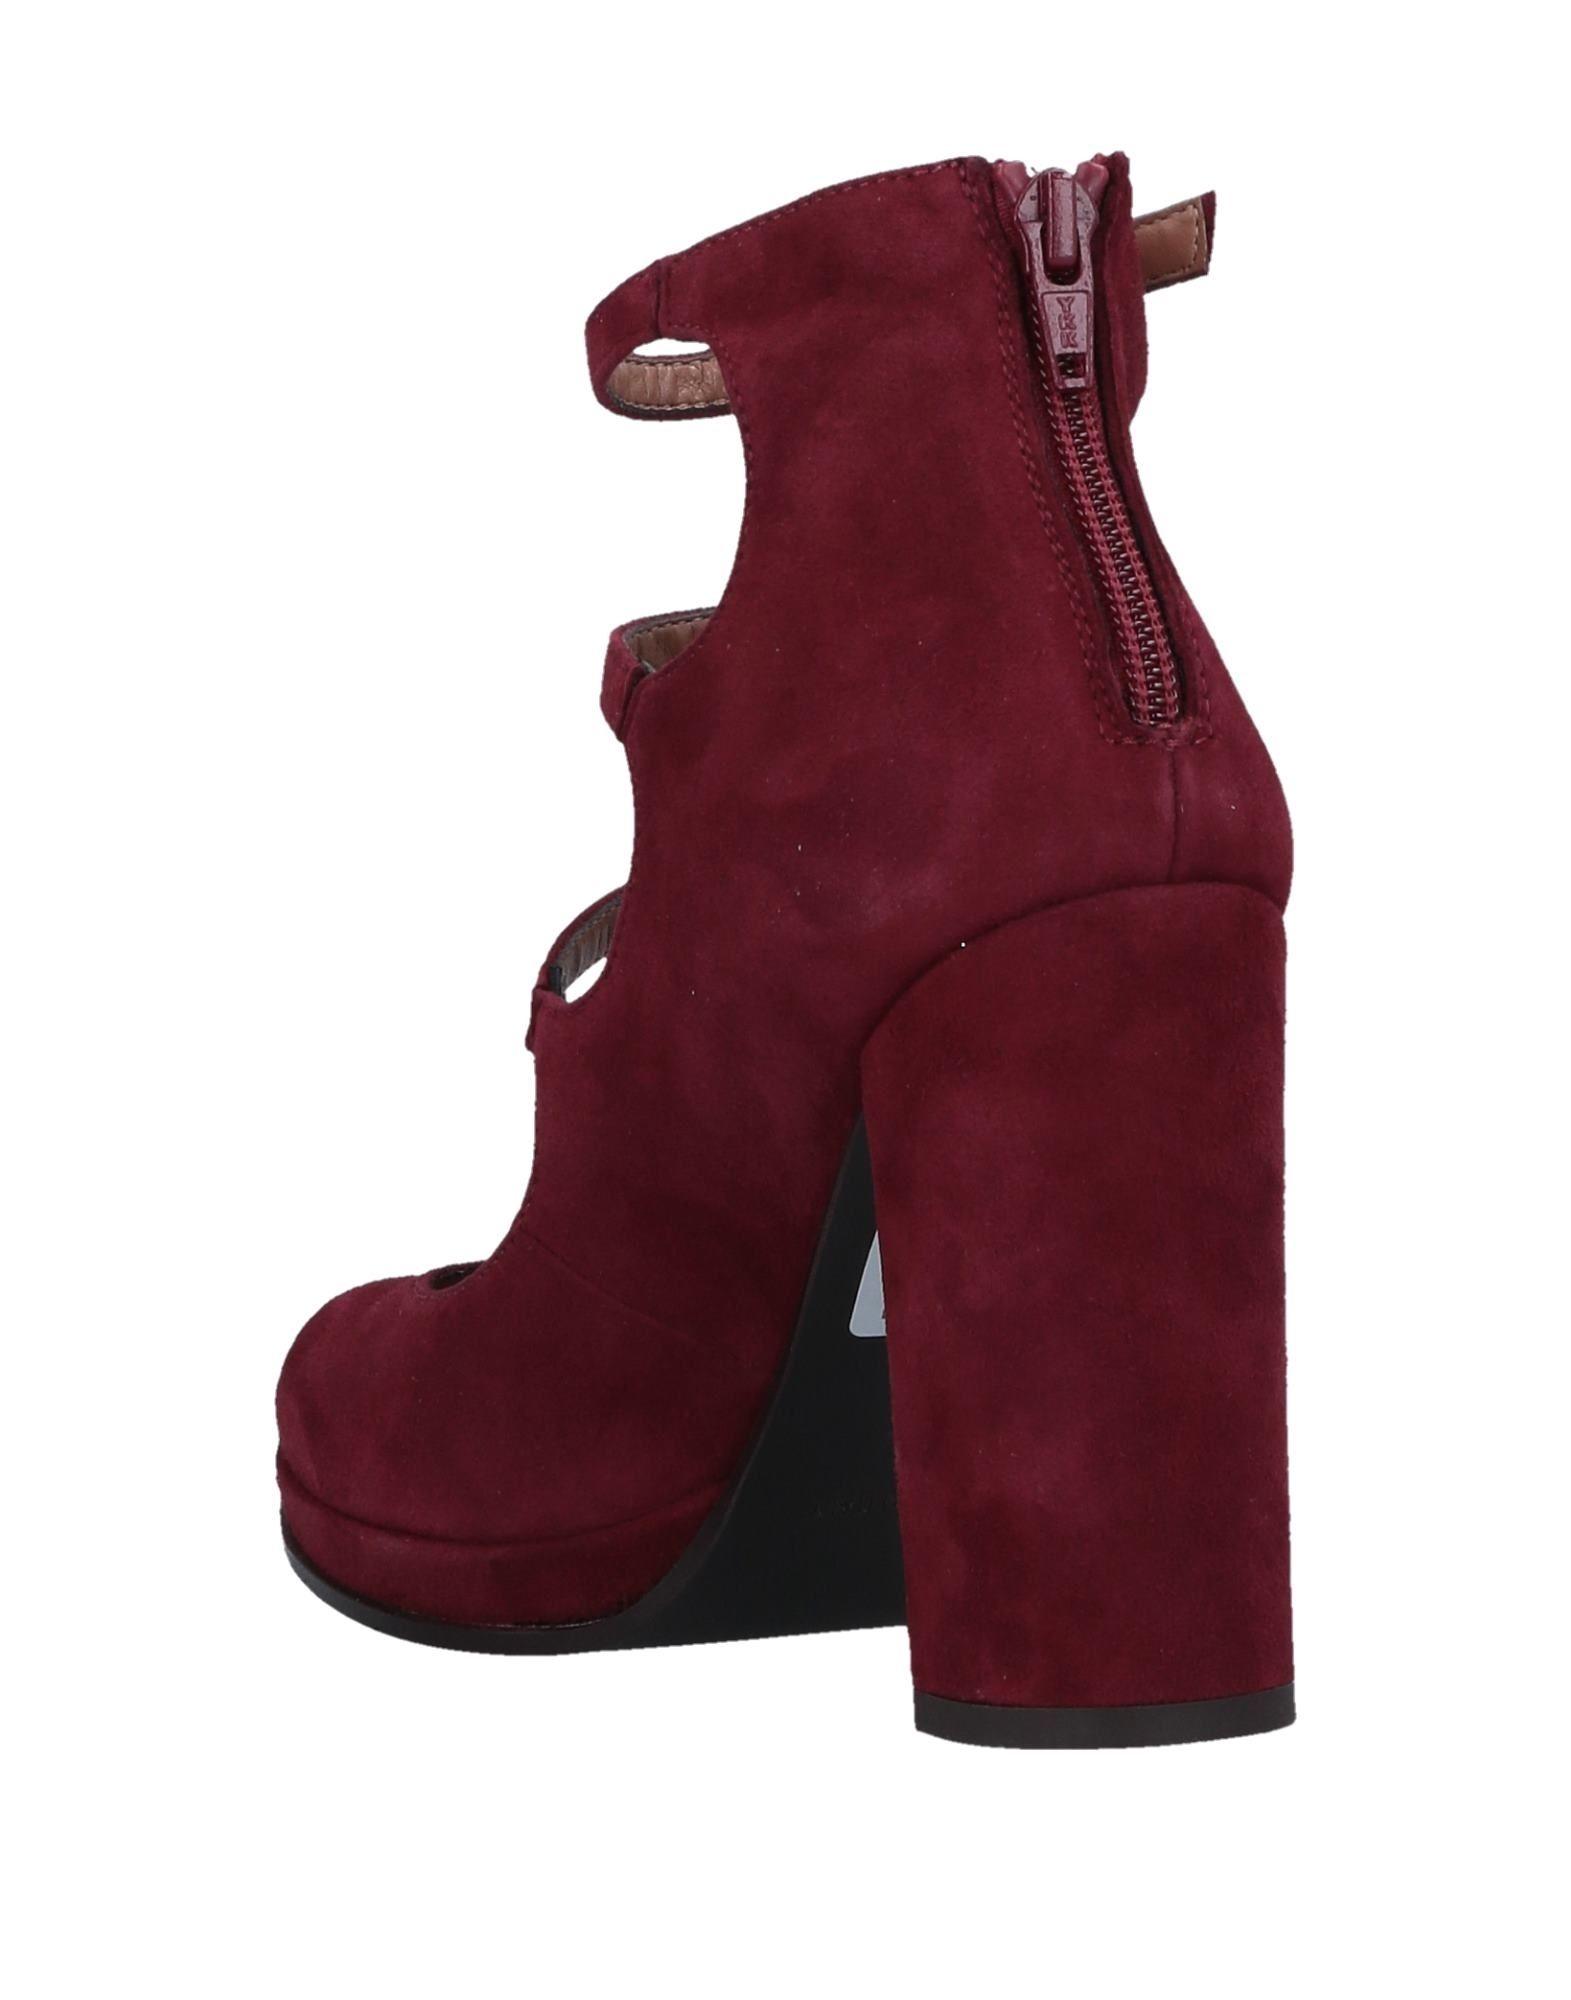 Eliana Bucci Gute Pumps Damen  11532435WK Gute Bucci Qualität beliebte Schuhe 48effa